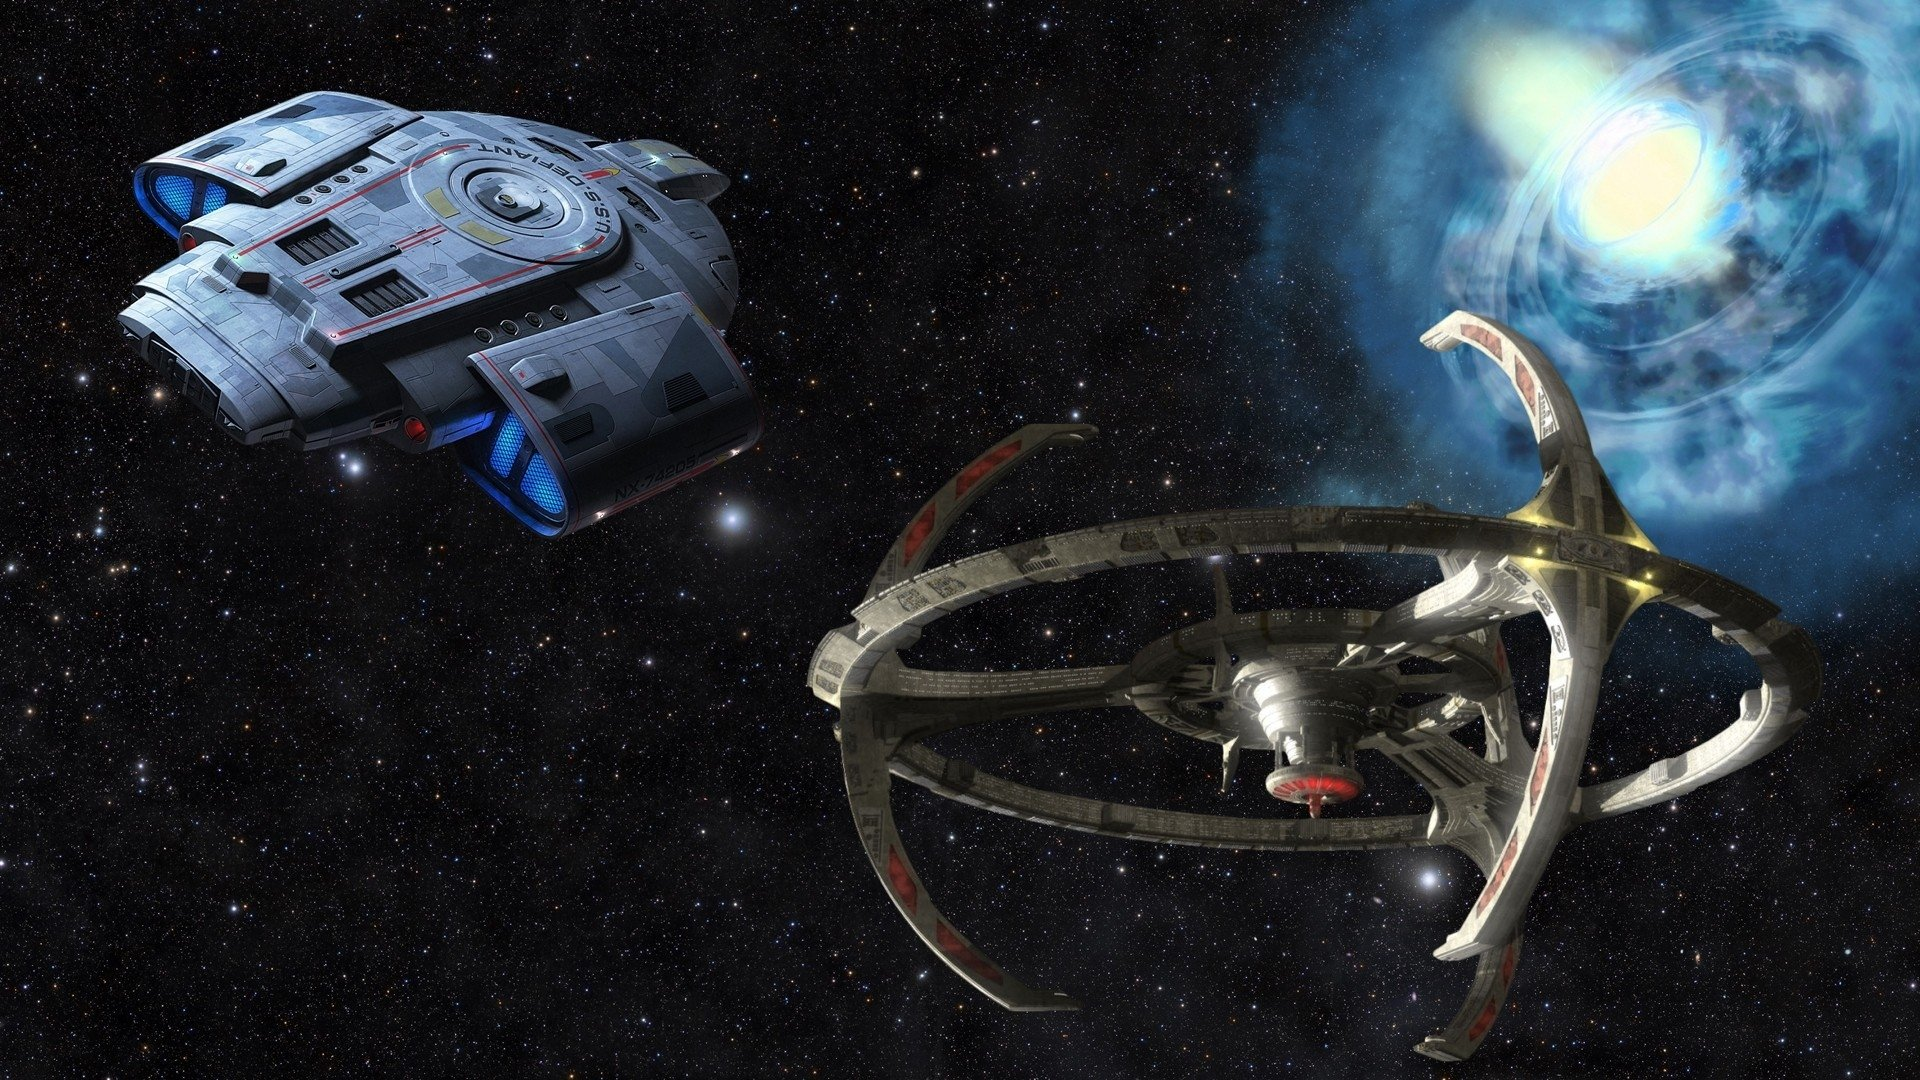 Star Trek USS Defiant · HD Wallpaper | Background Image ID:789953